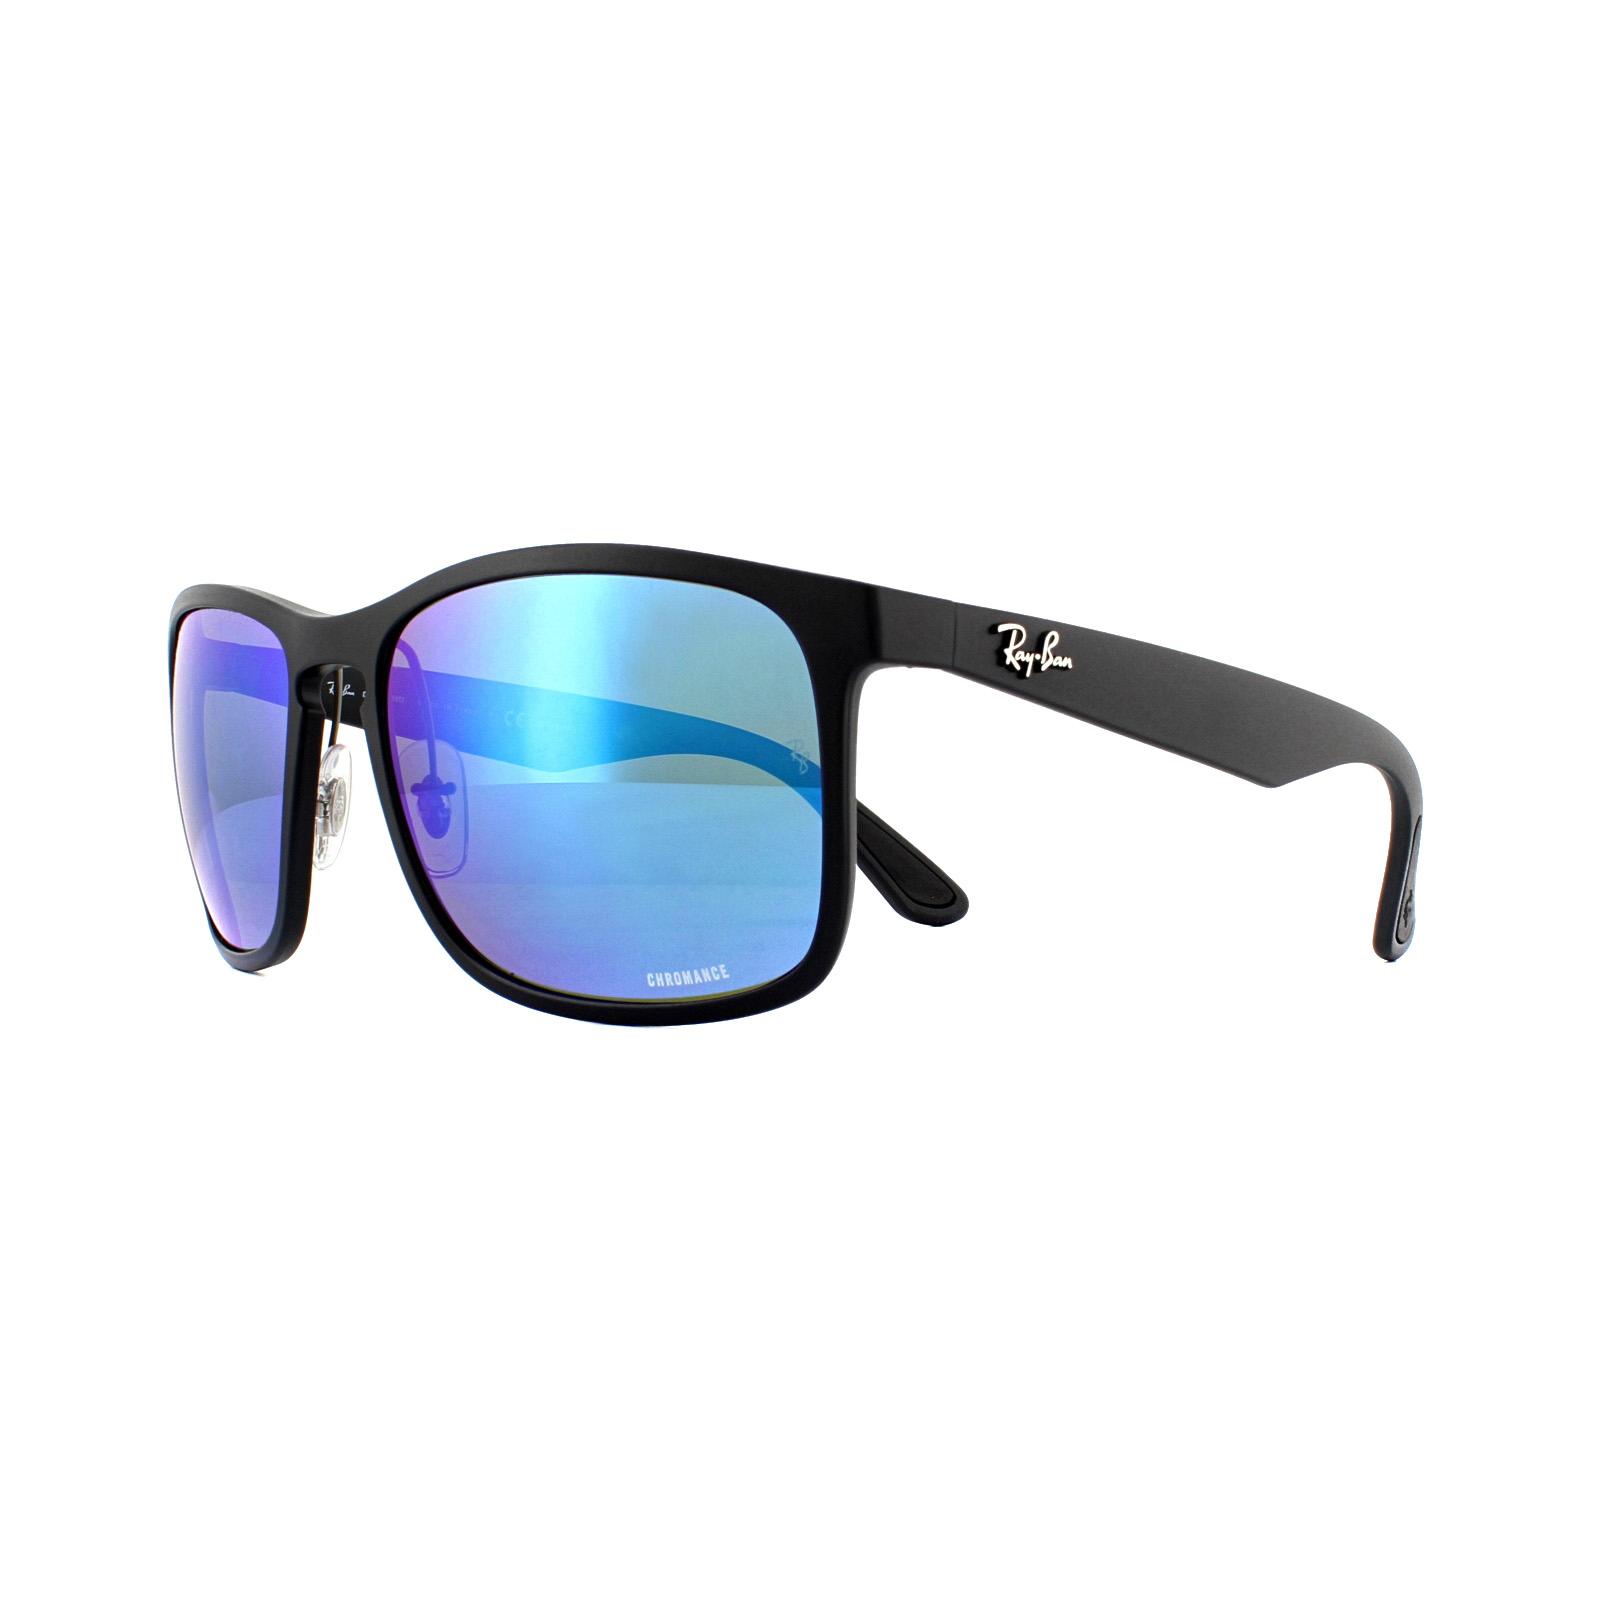 270bea06c9b44 Sentinel Ray-Ban Sunglasses RB4264 601SA1 Matte Black Blue Flash Polarized  Chromance